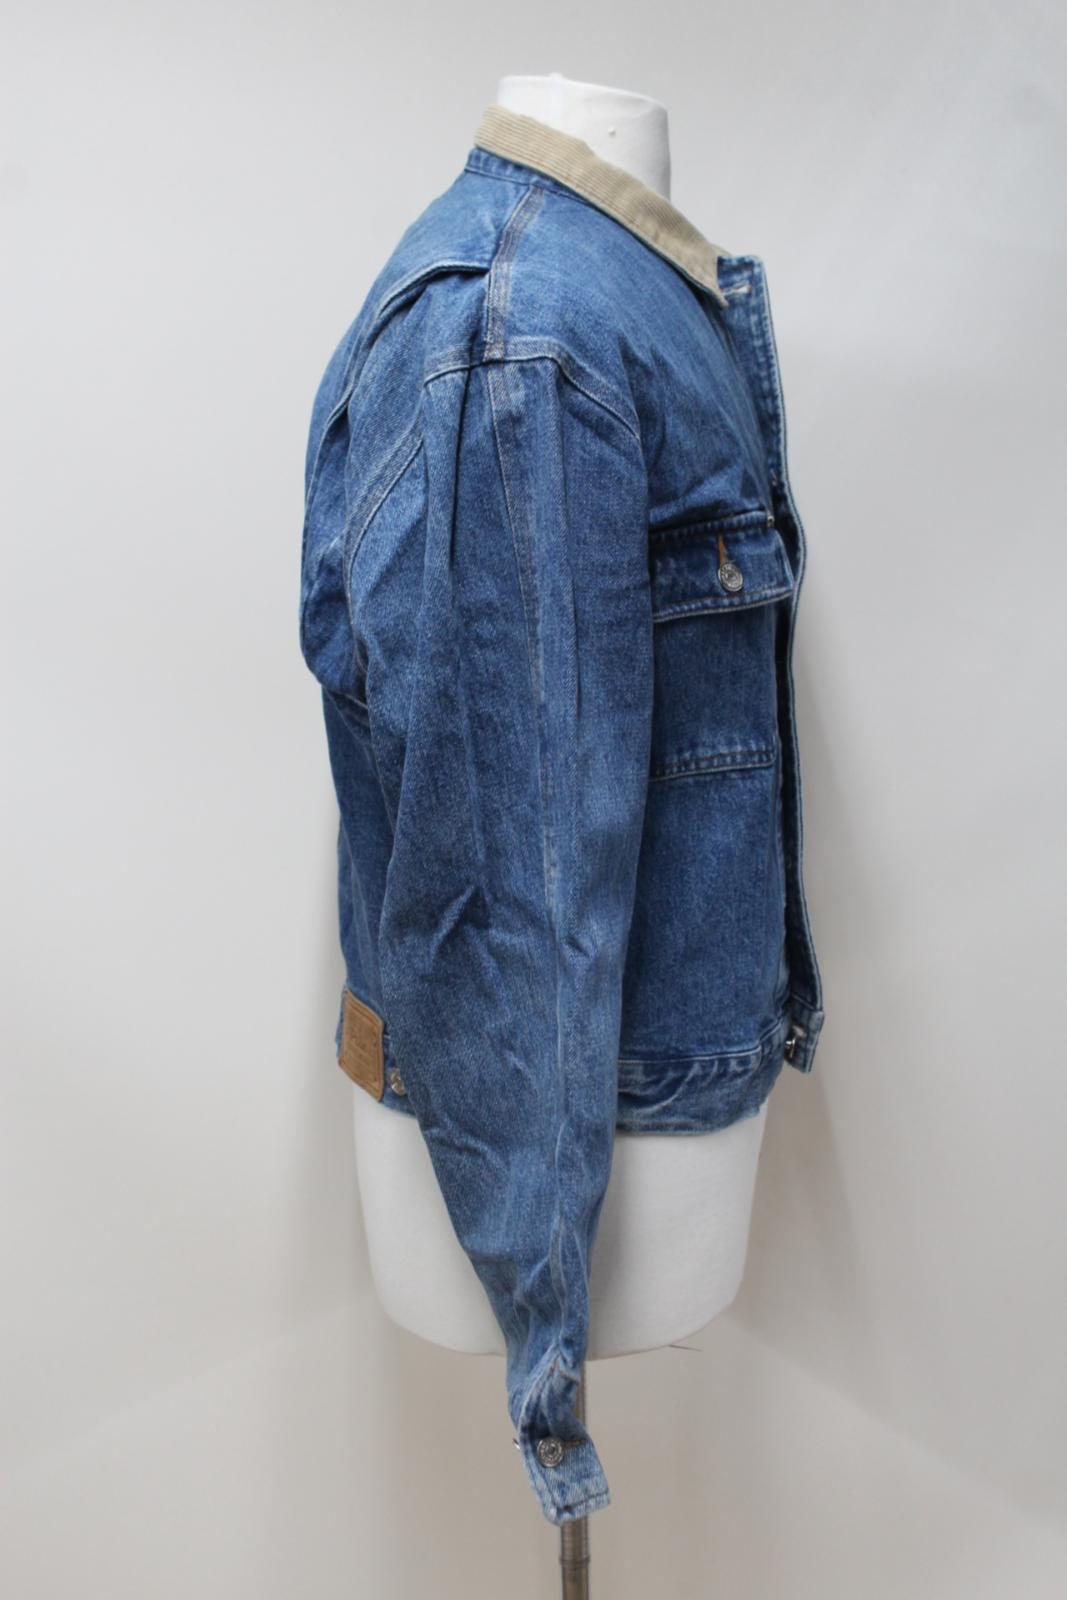 Lauren a Denim W Velluto Colletto Jacket Ralph Vintage Polo Taglia Up Button L coste TqnRZCwH